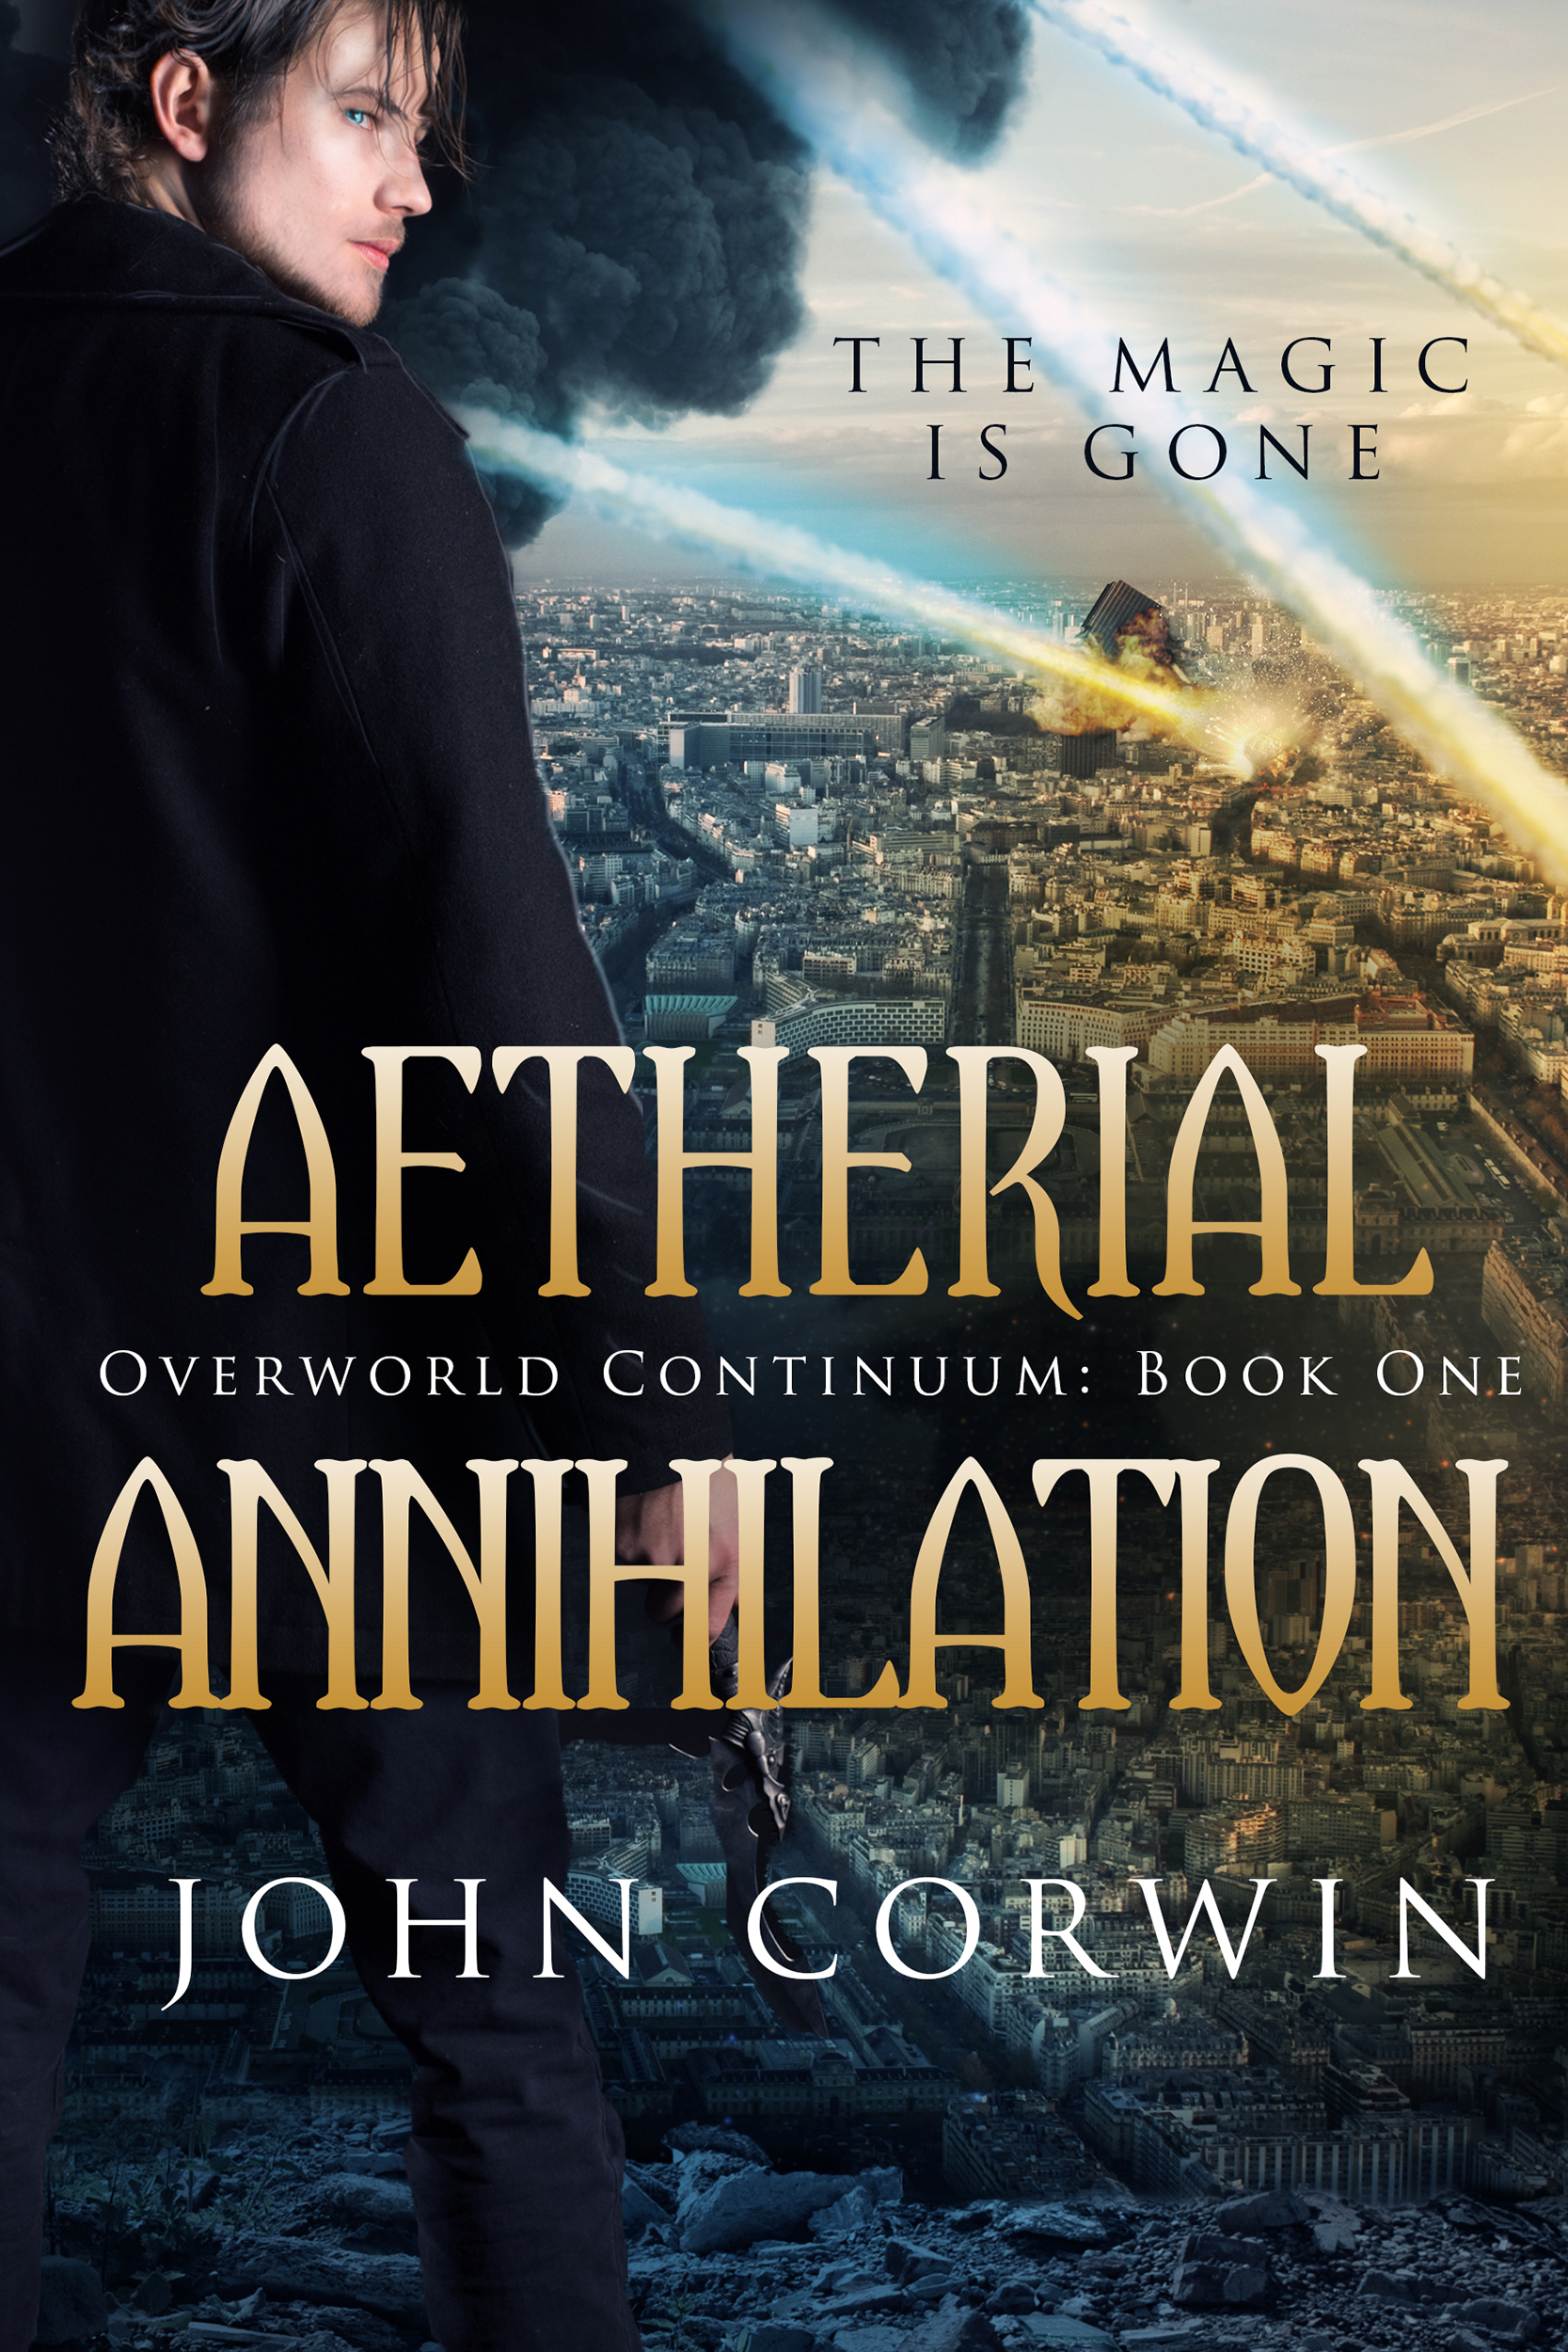 Aetherial Annihilation